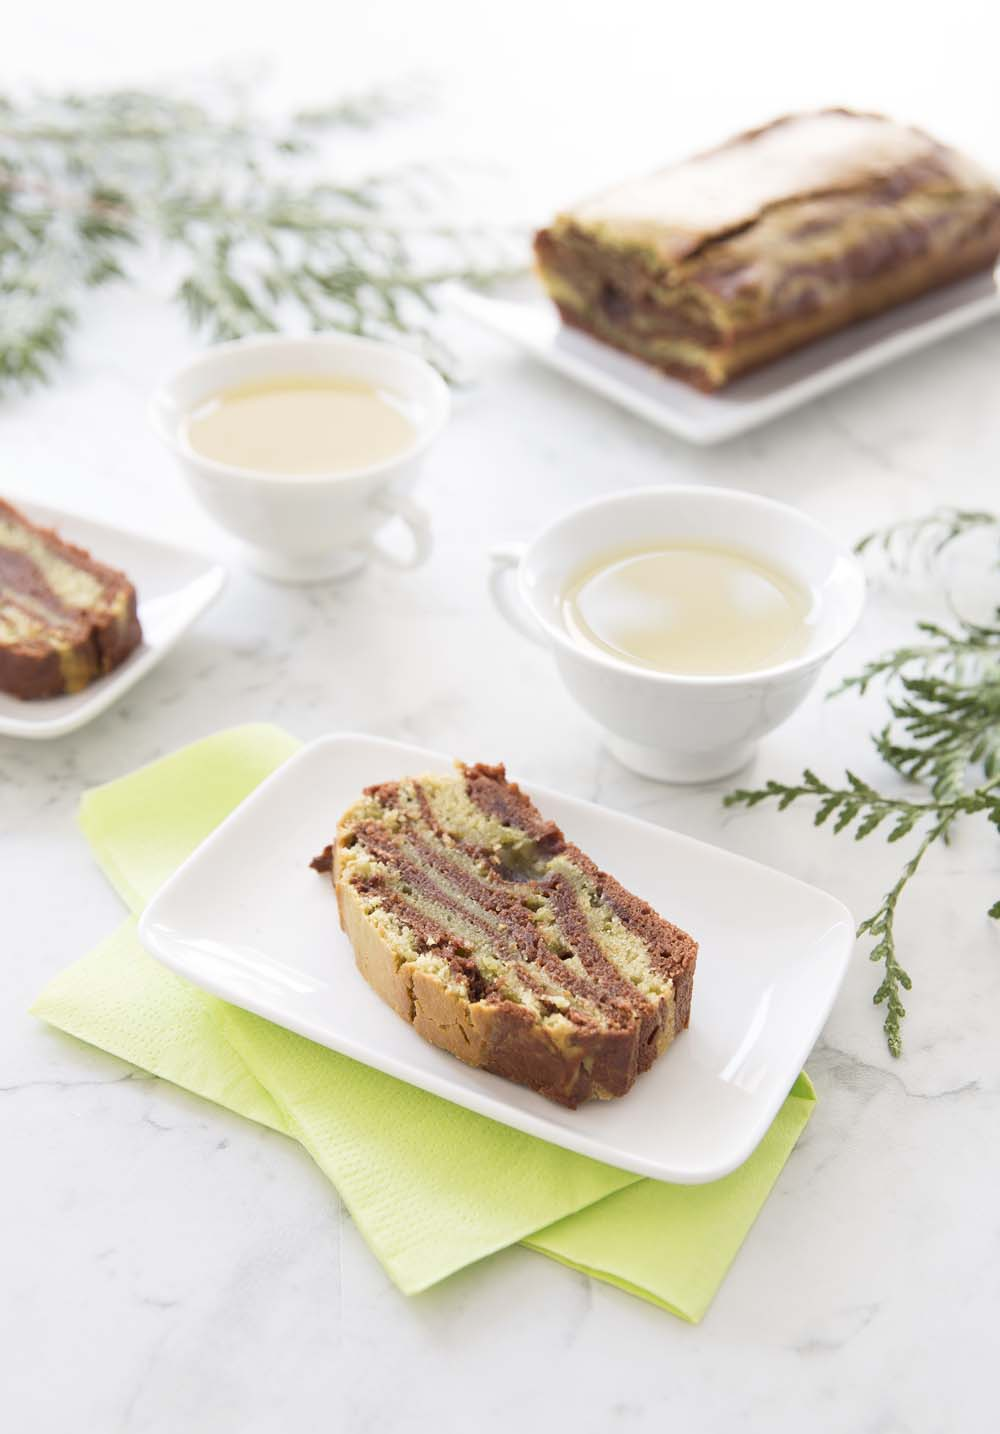 cake marbr chocolat matcha vegan recettes de cuisine biod lices. Black Bedroom Furniture Sets. Home Design Ideas